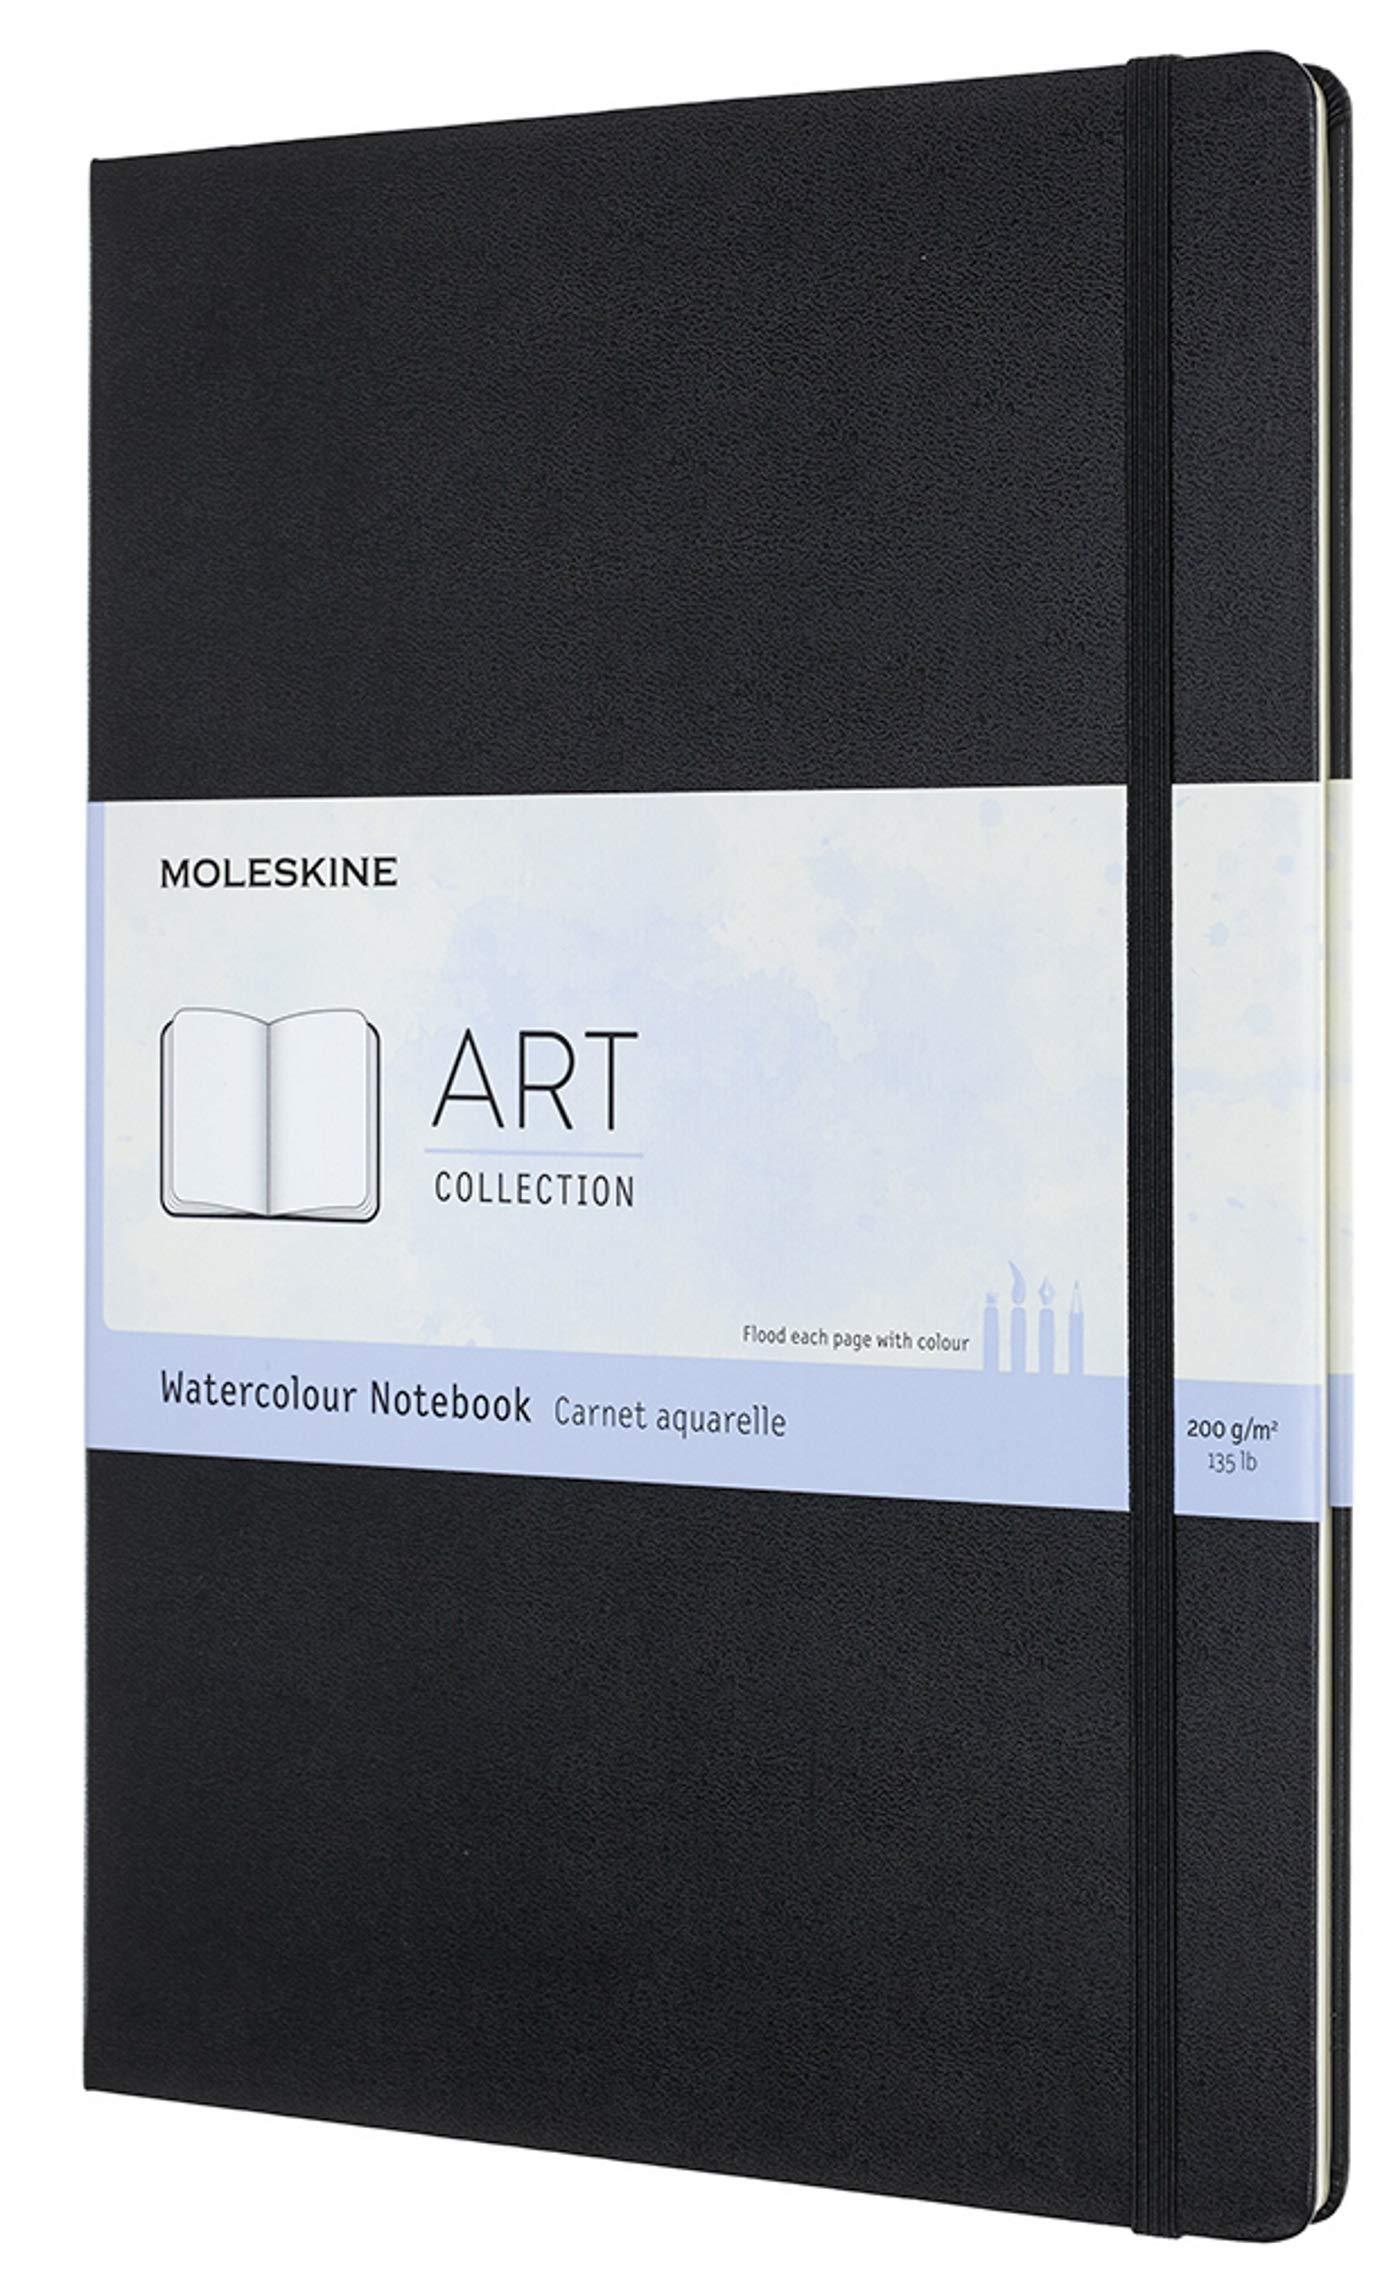 Moleskine Art Watercolor Notebook, Hard Cover, A4 (8.25'' x 11.75'') Plain/Blank, Black